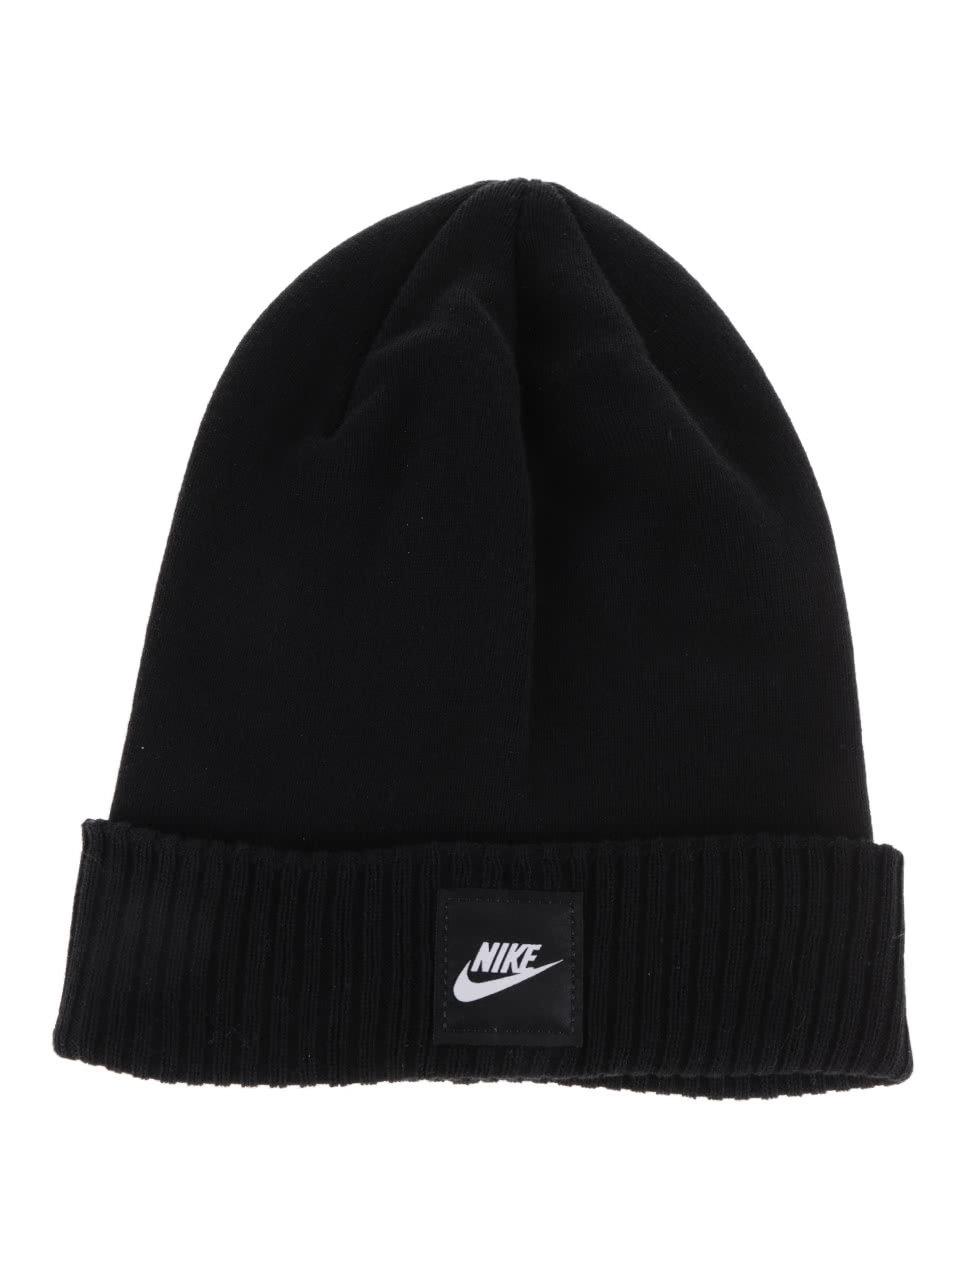 Černá pánská čepice s logem Nike Futura ... 46bbeeb673